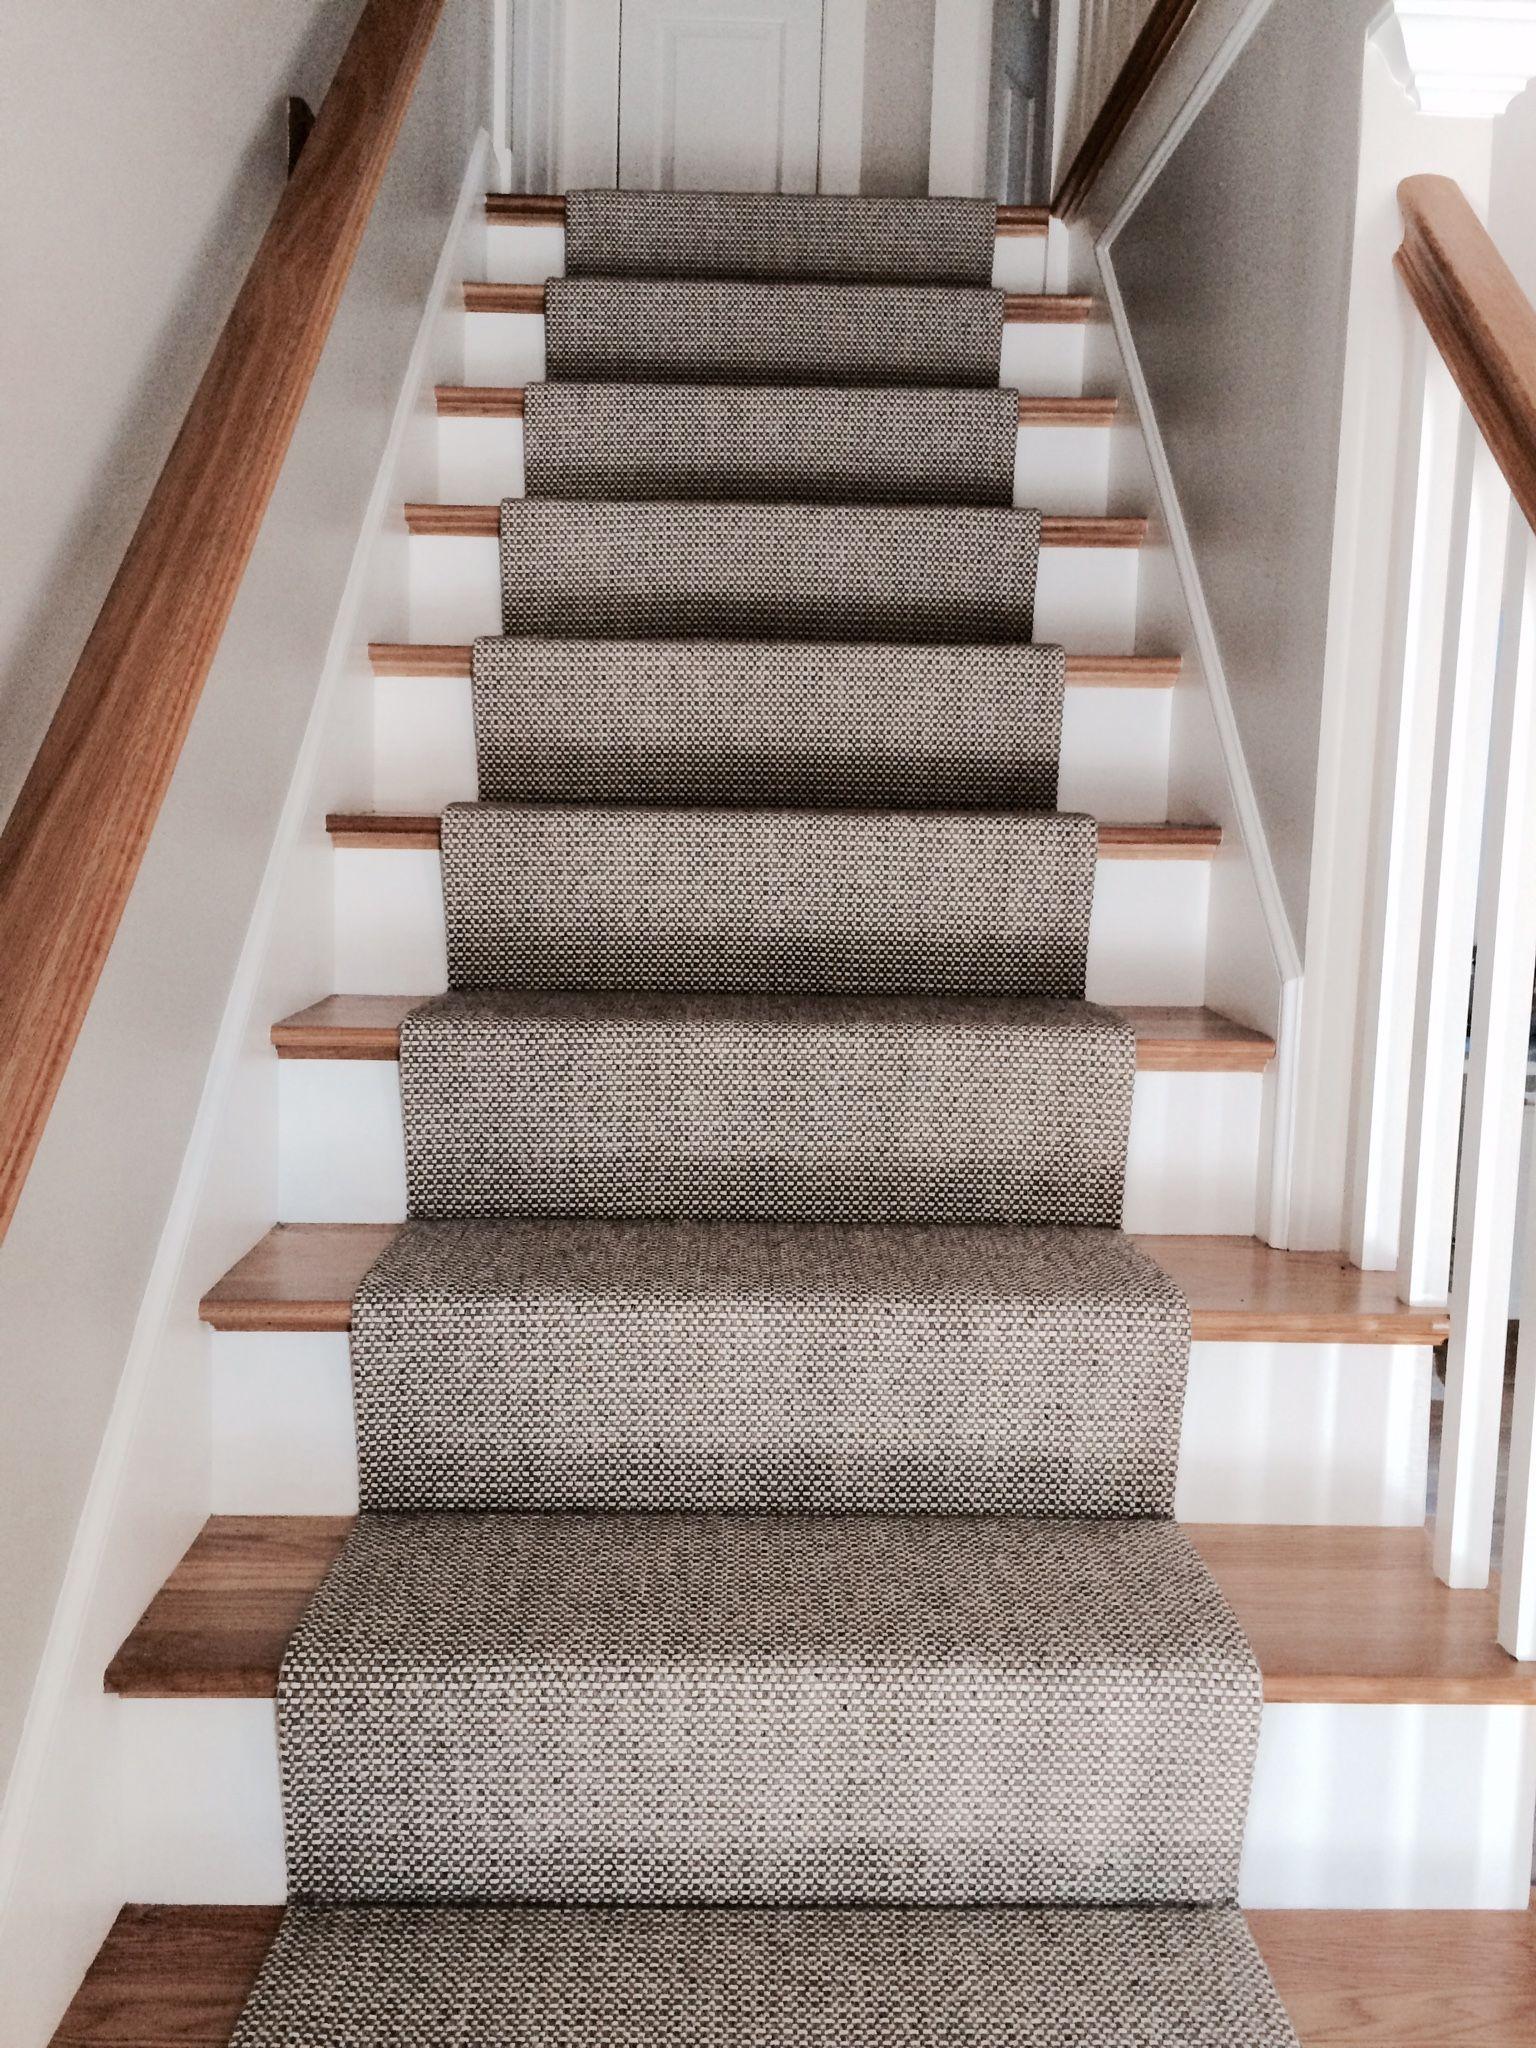 Merida Flat Woven Wool Stair Runner By The Carpet Workroom The | Rug Runners For Stairs | Wood | Antelope | Hallway | Persian | Mid Century Modern